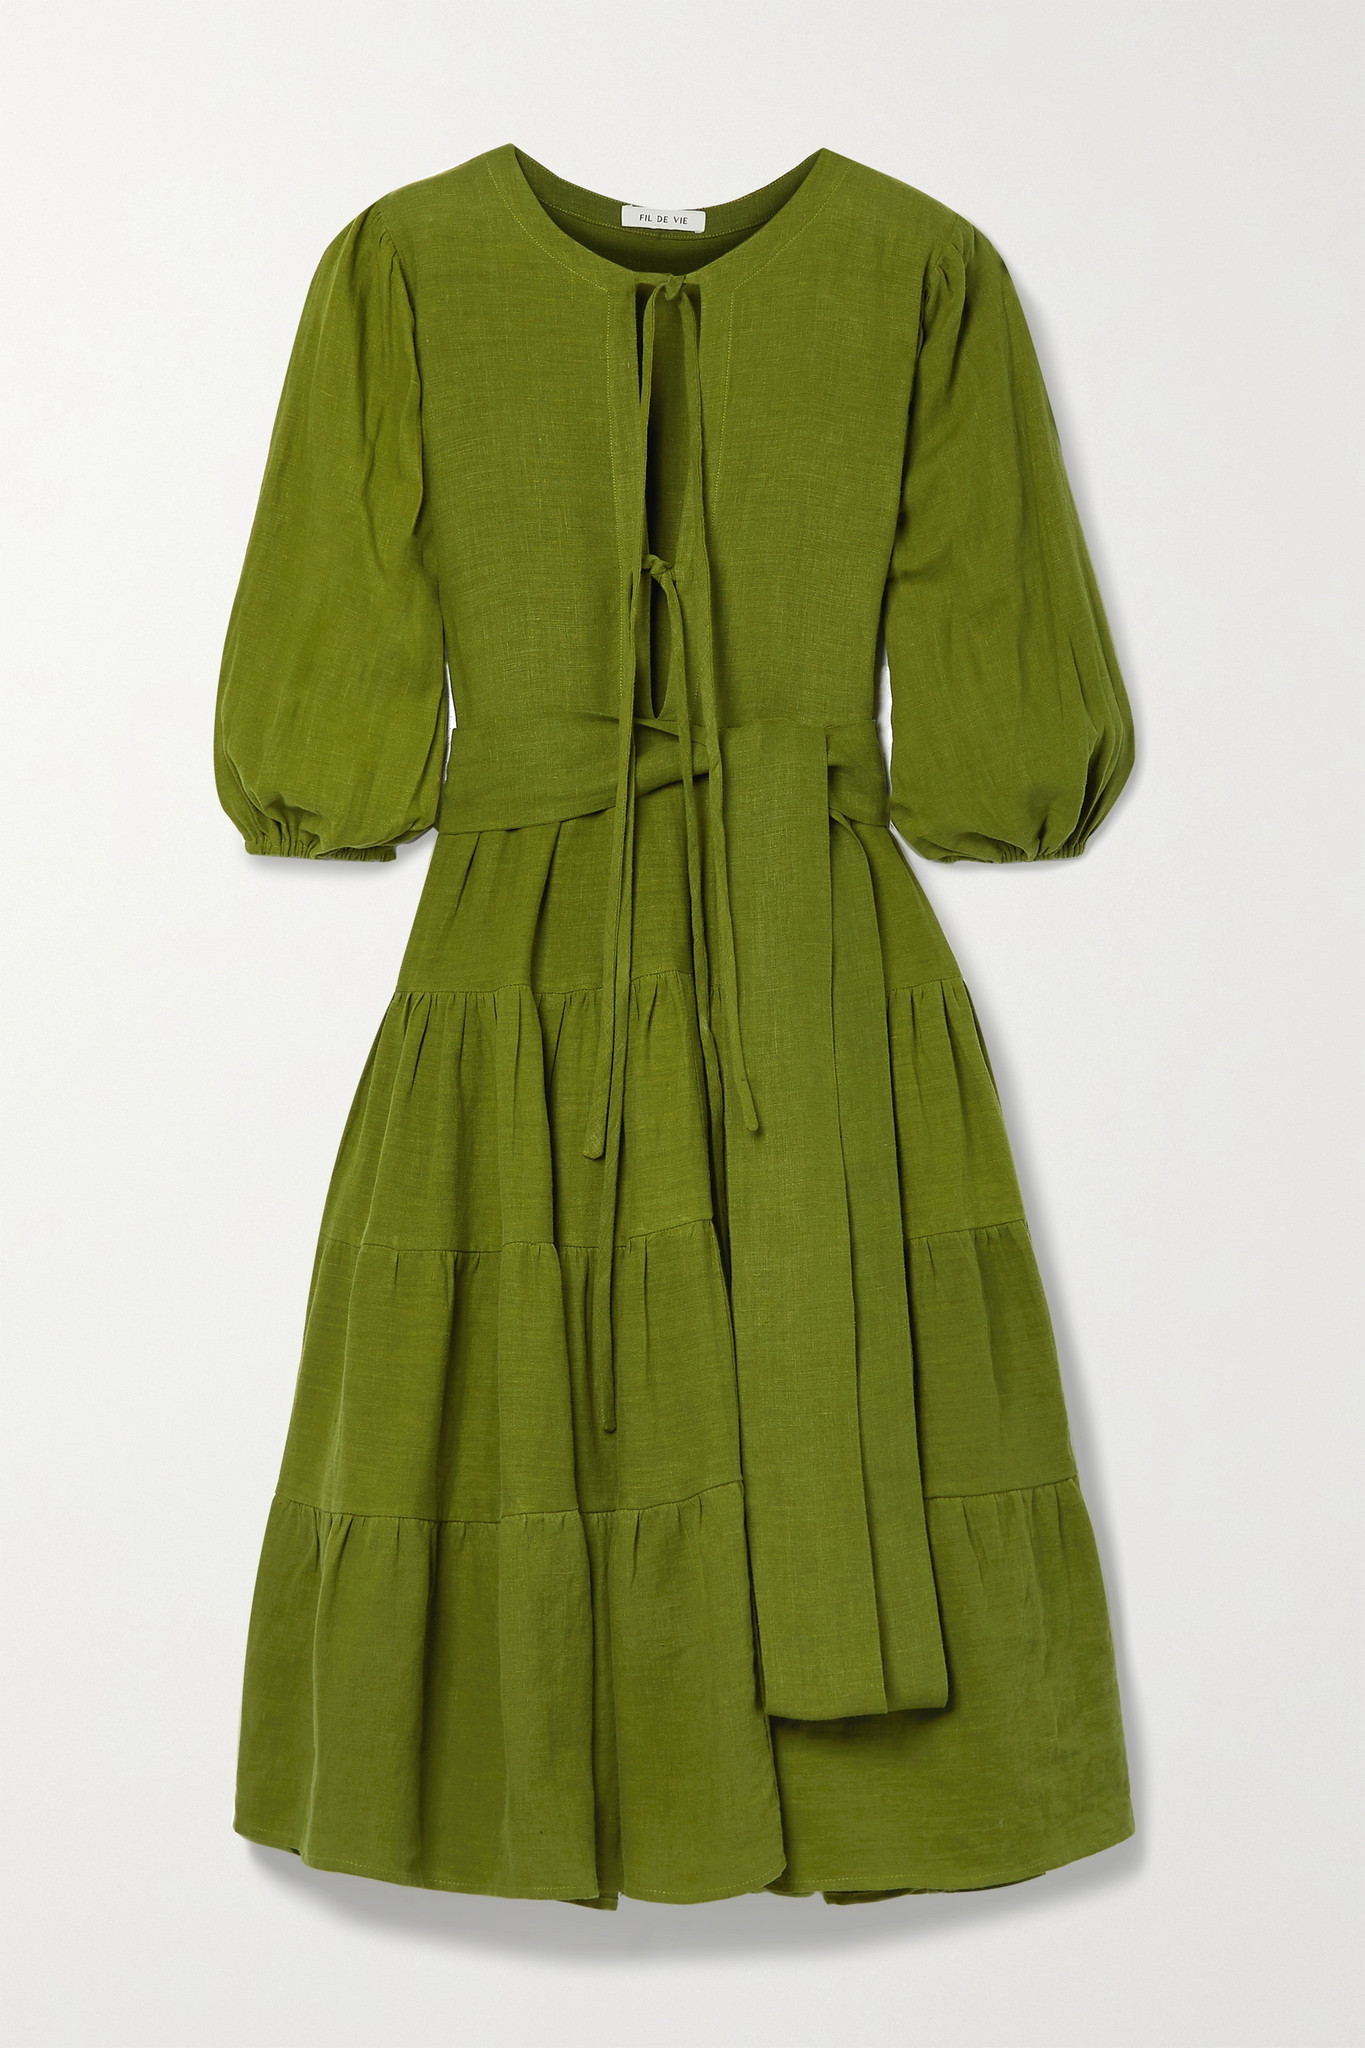 FIL DE VIE - 【net Sustain】medina 配腰带层接式亚麻中长连衣裙 - 绿色 - medium